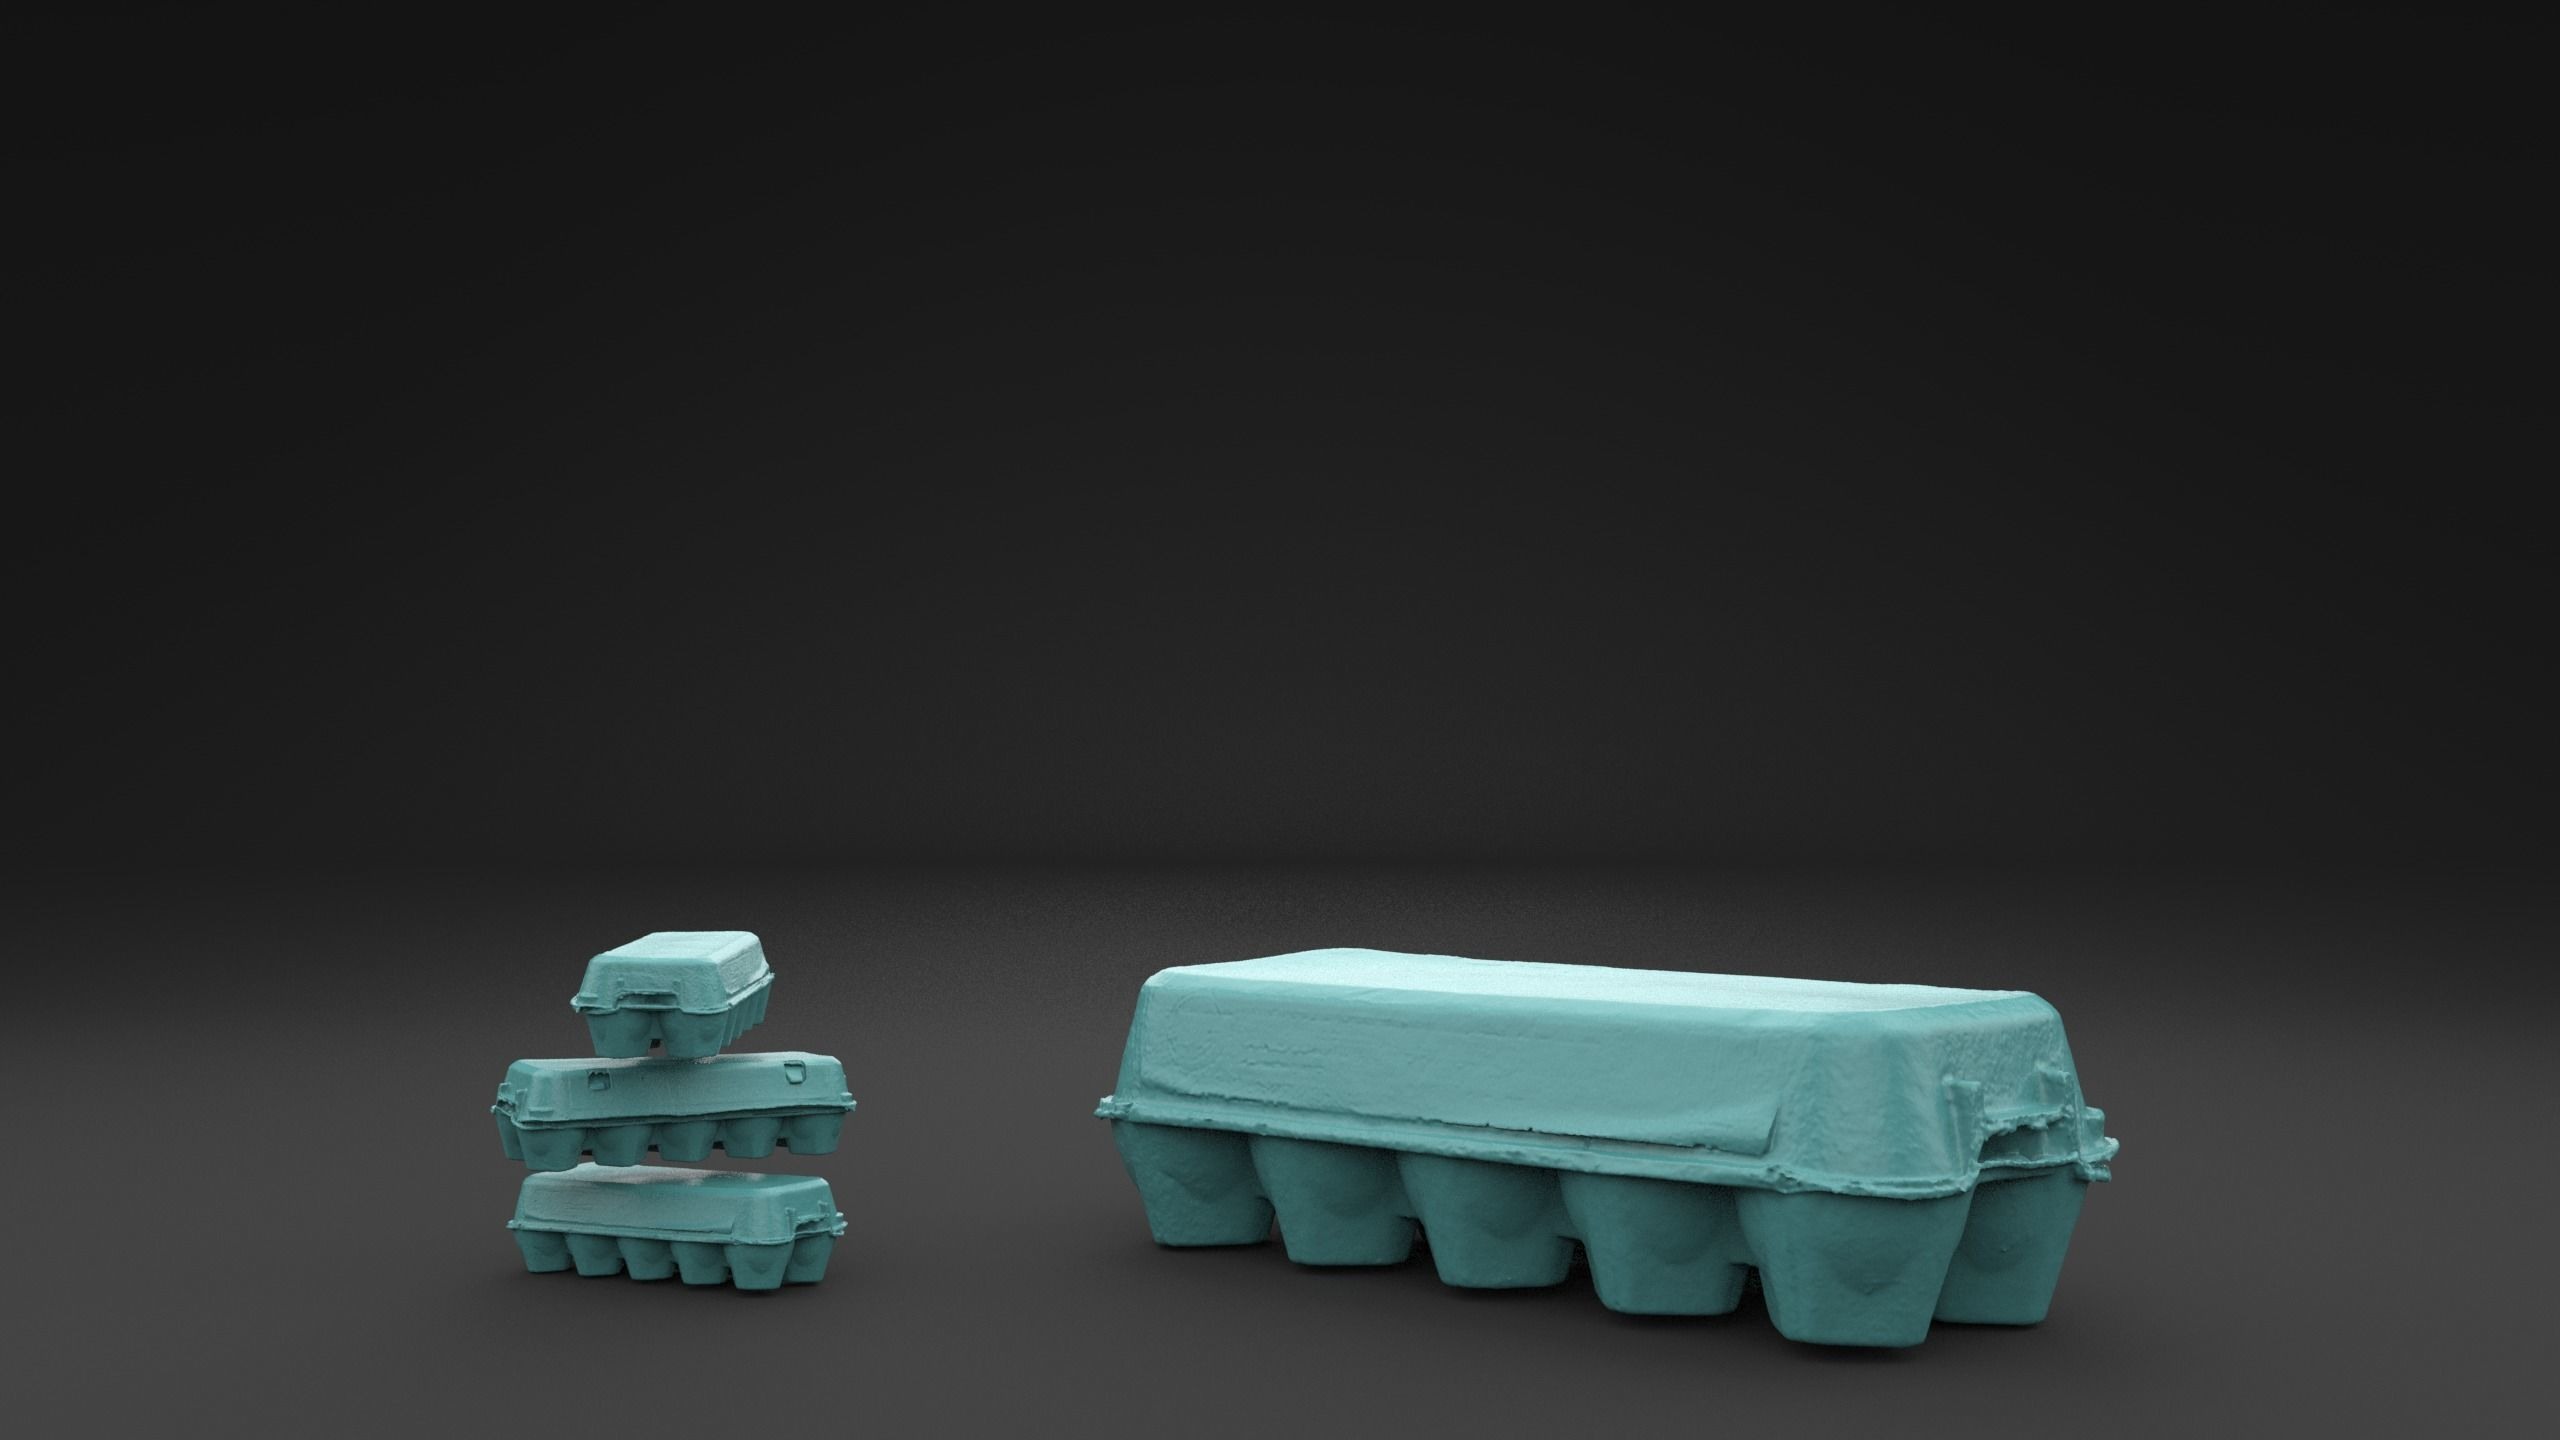 Scanned Egg Tray 3D Print Model